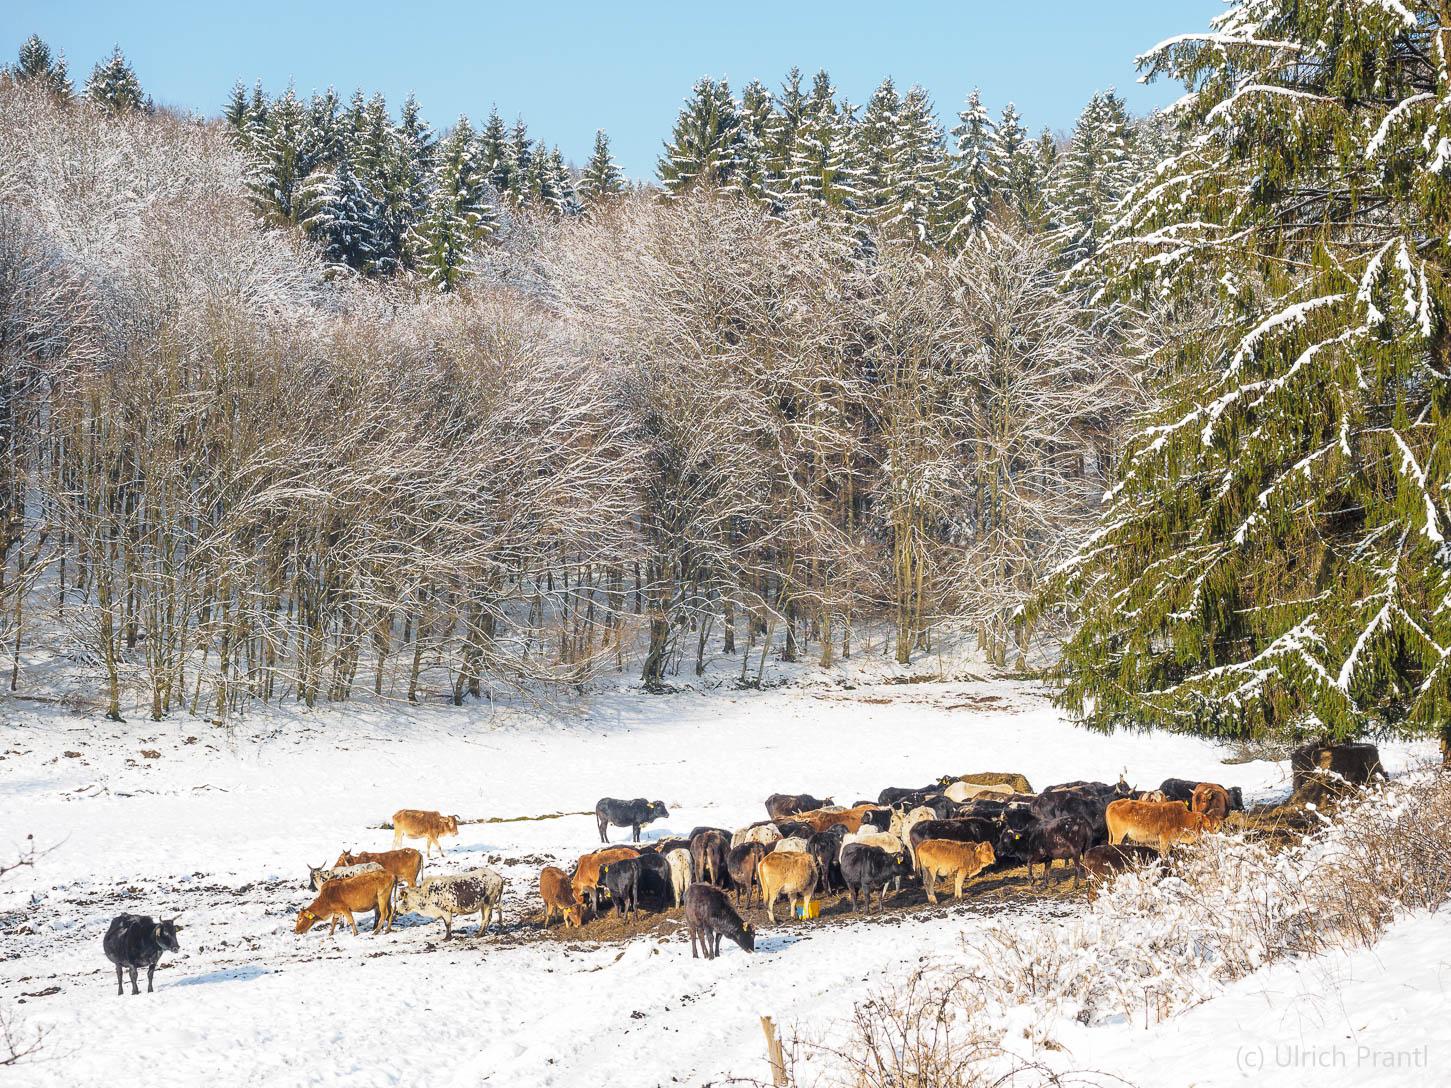 Dammbachtal, Zebuherde, Schnee